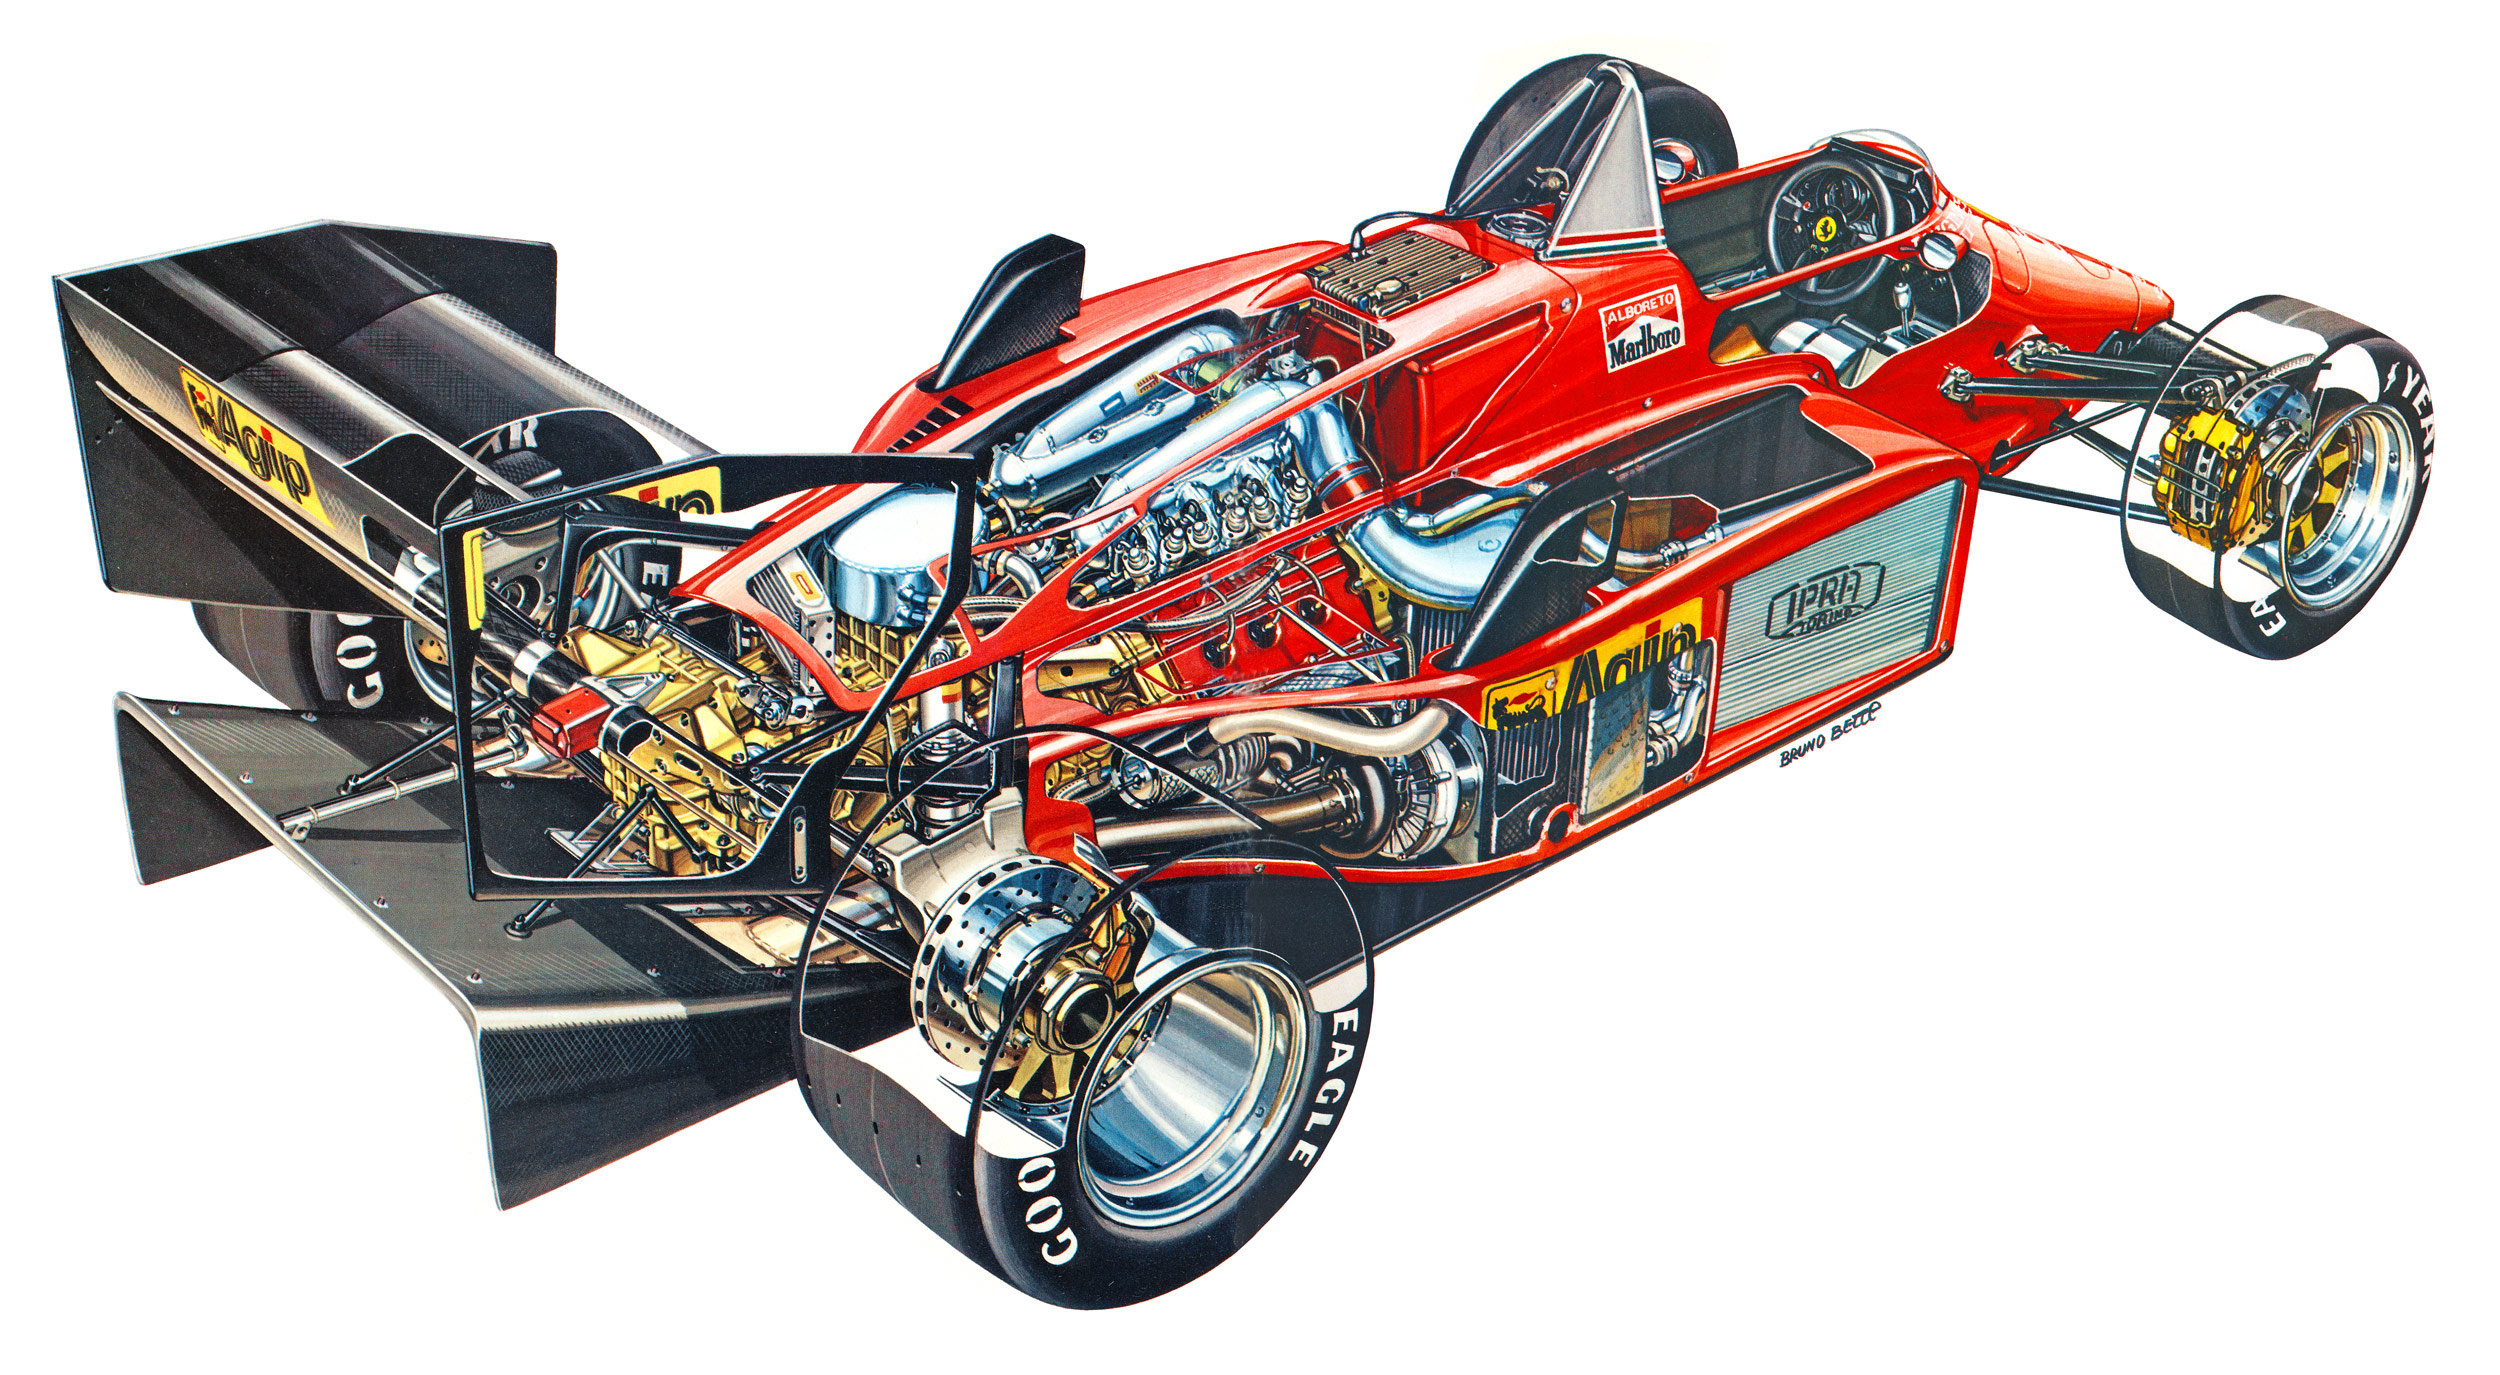 Ferrari 156/85 cutaway